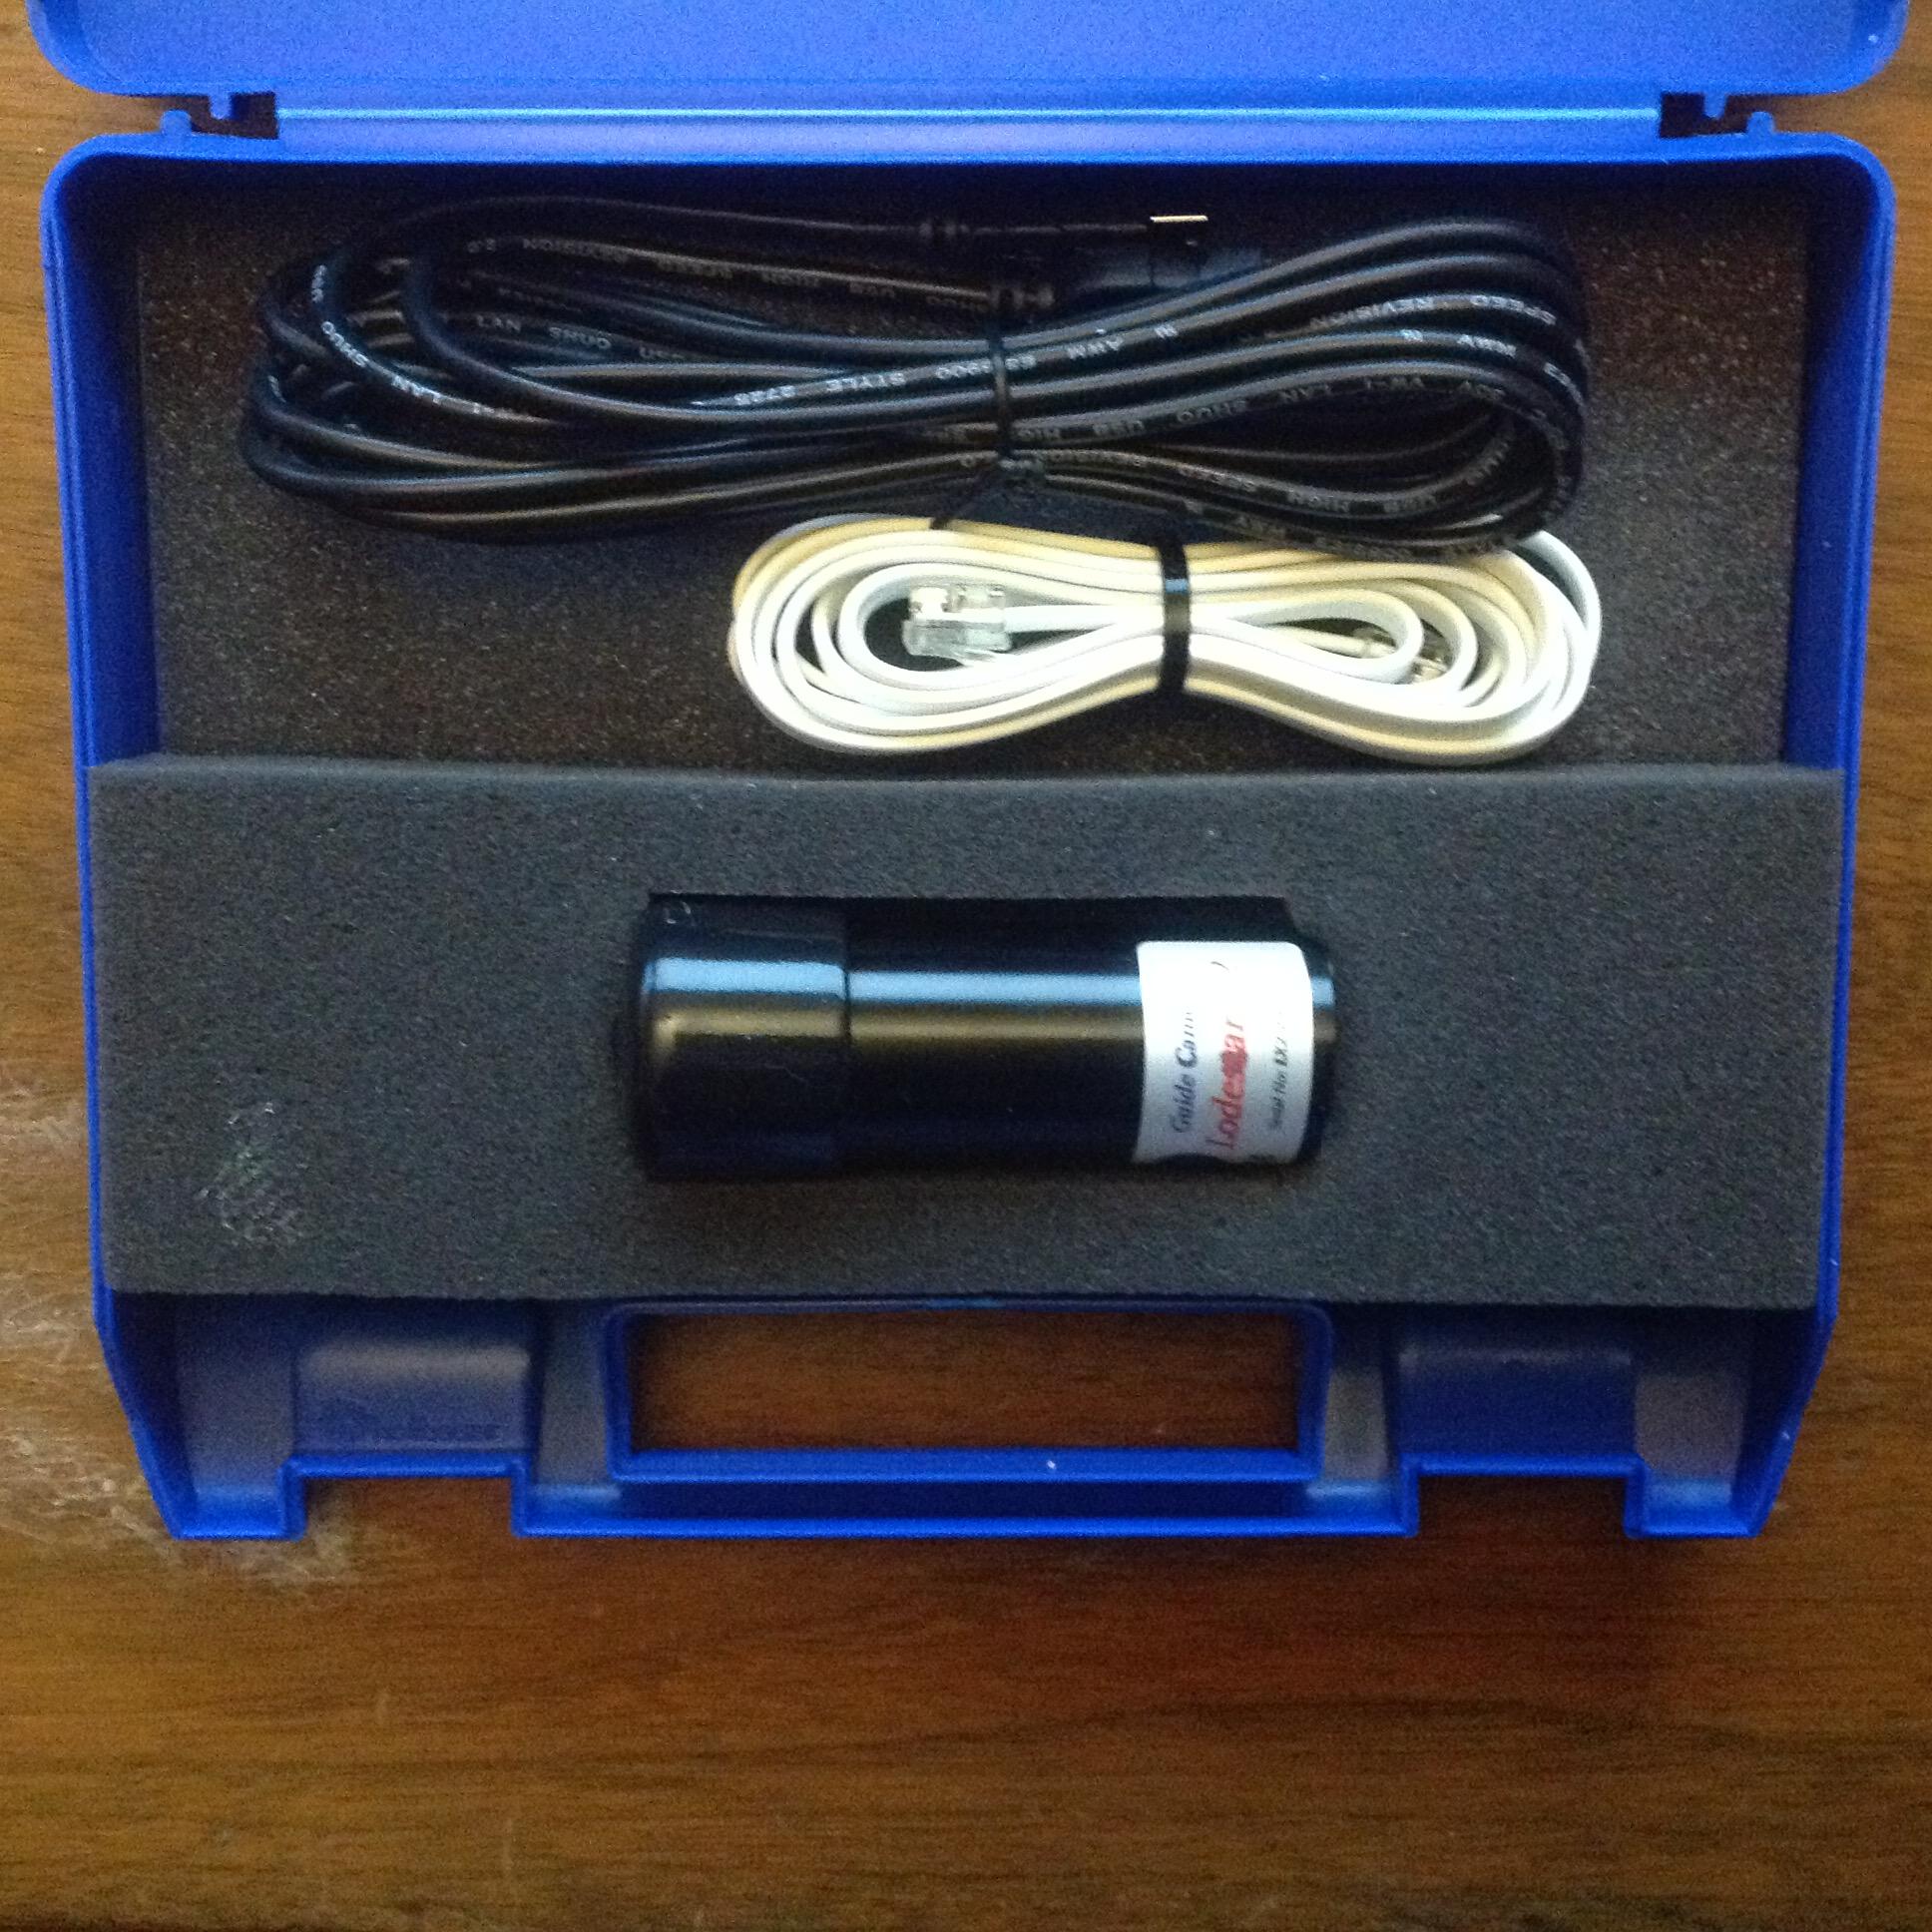 Lodestarx2 guiding camera